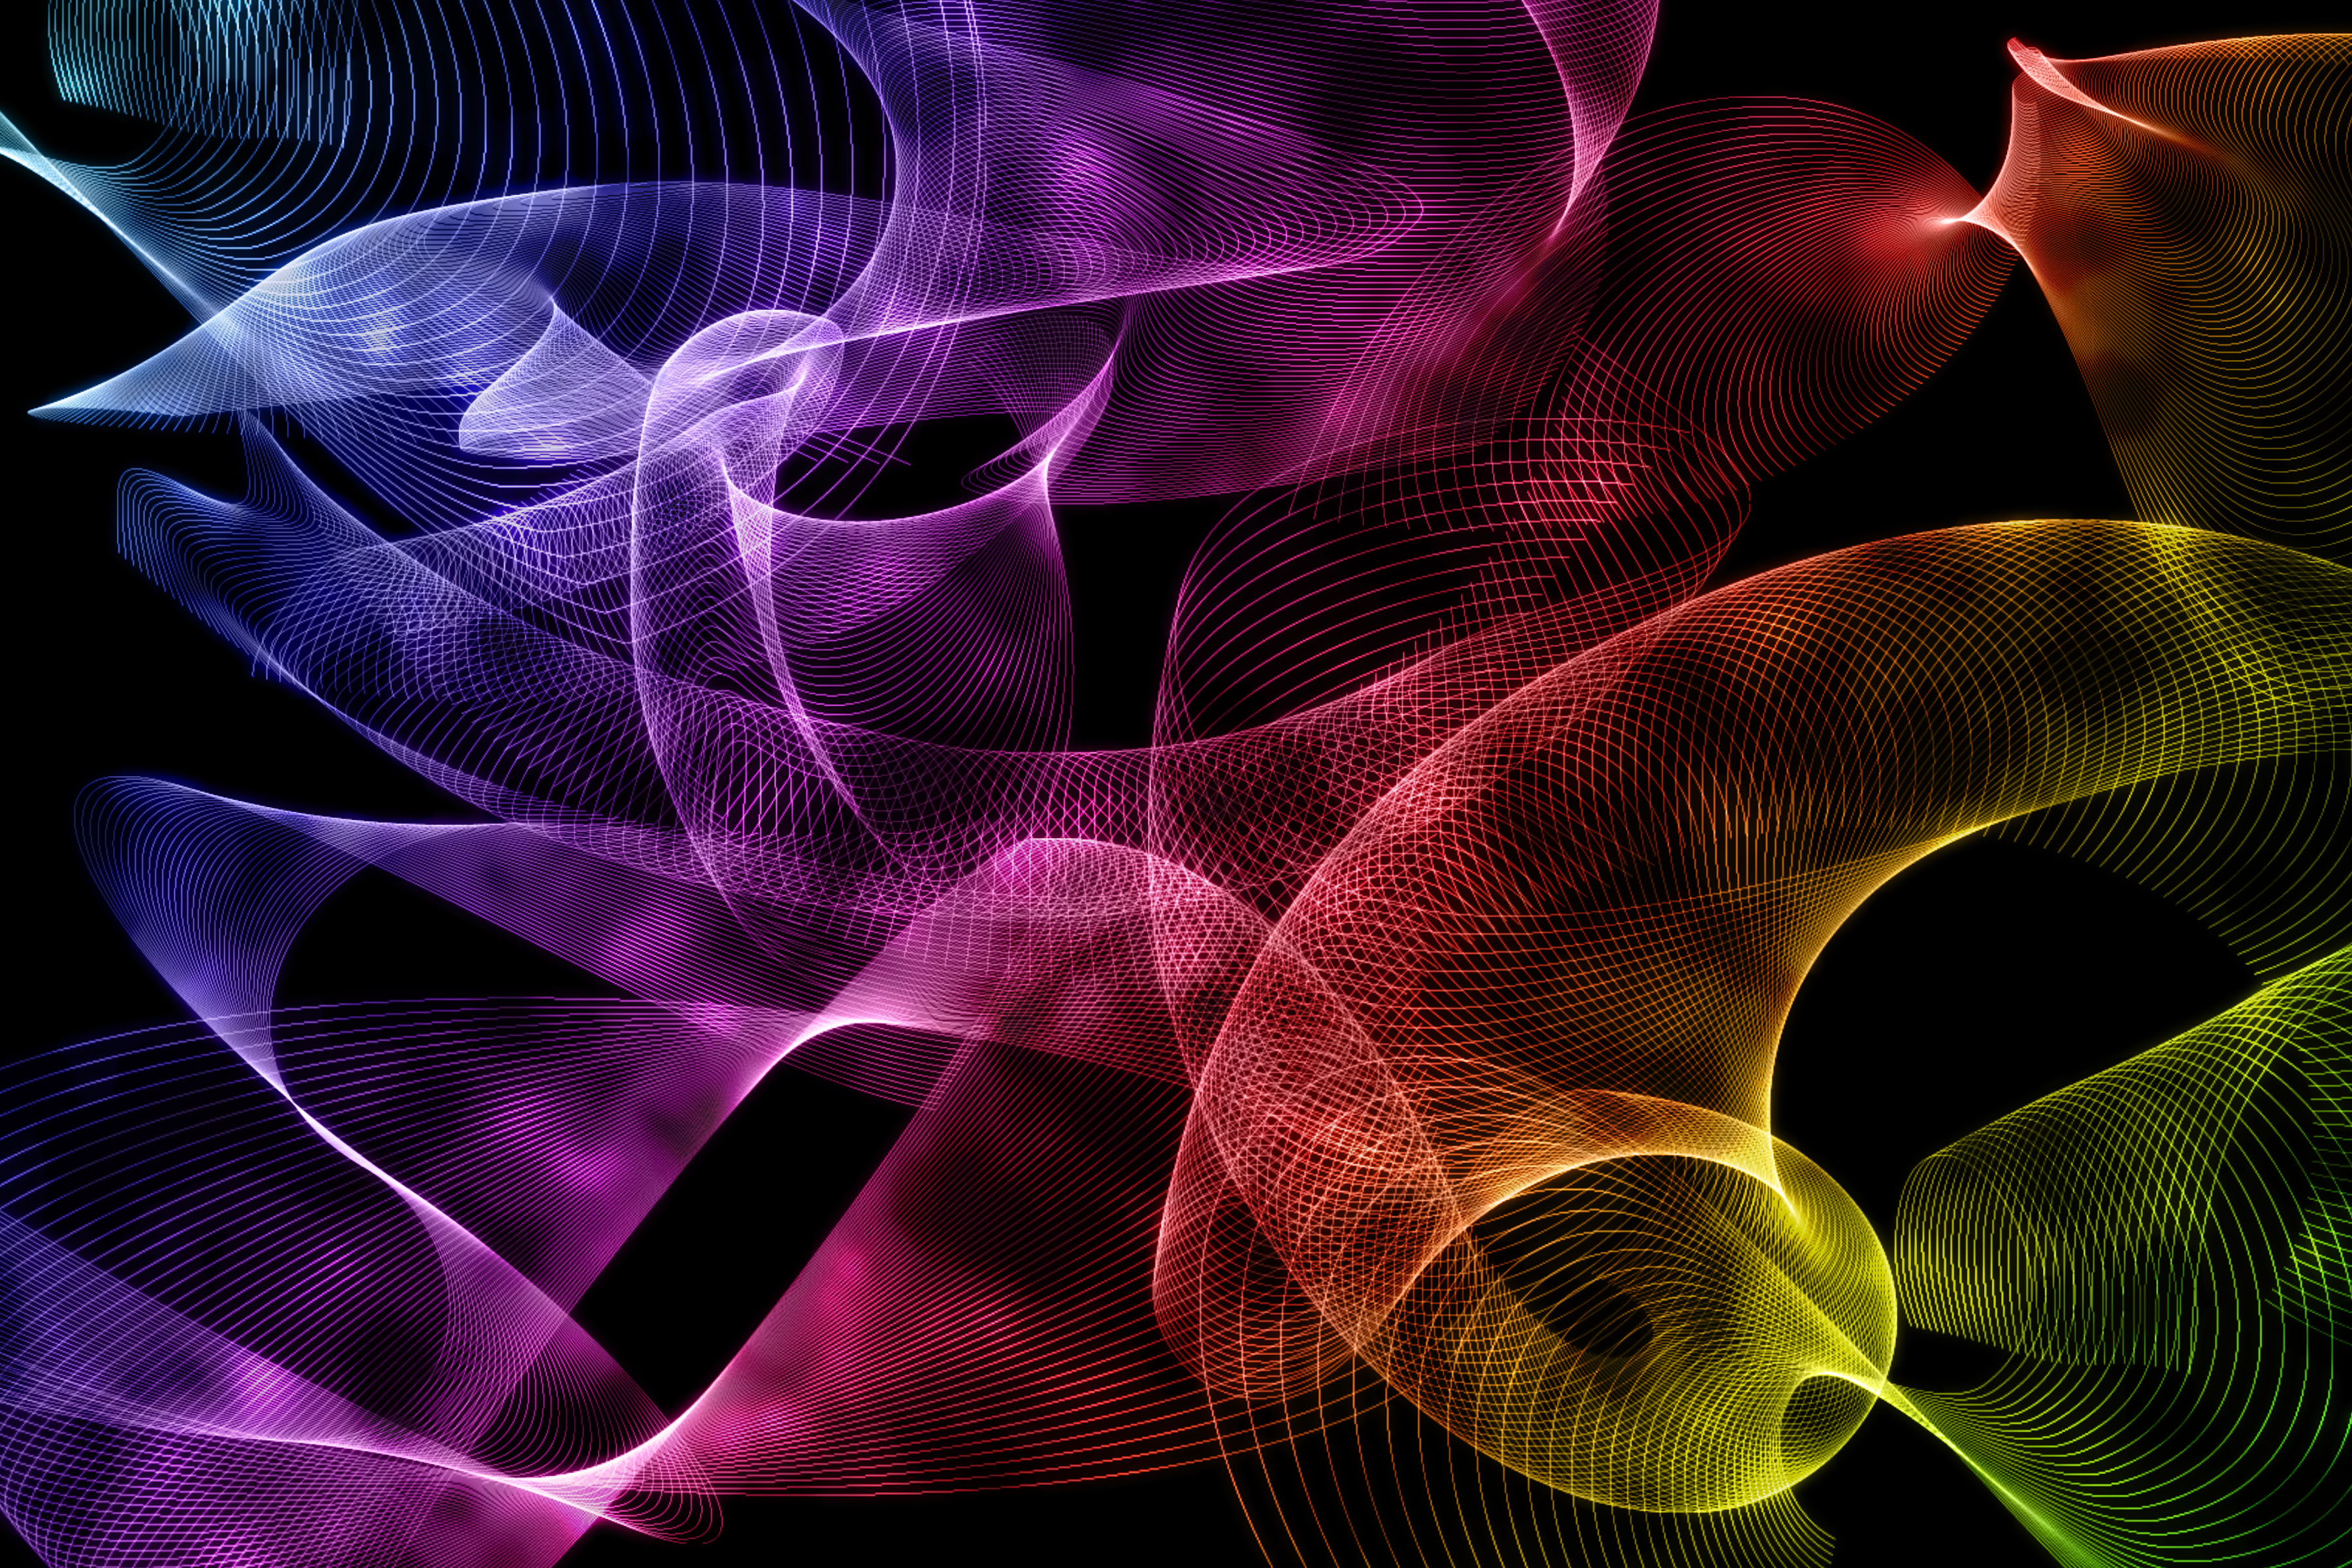 Random abstract by lumenus